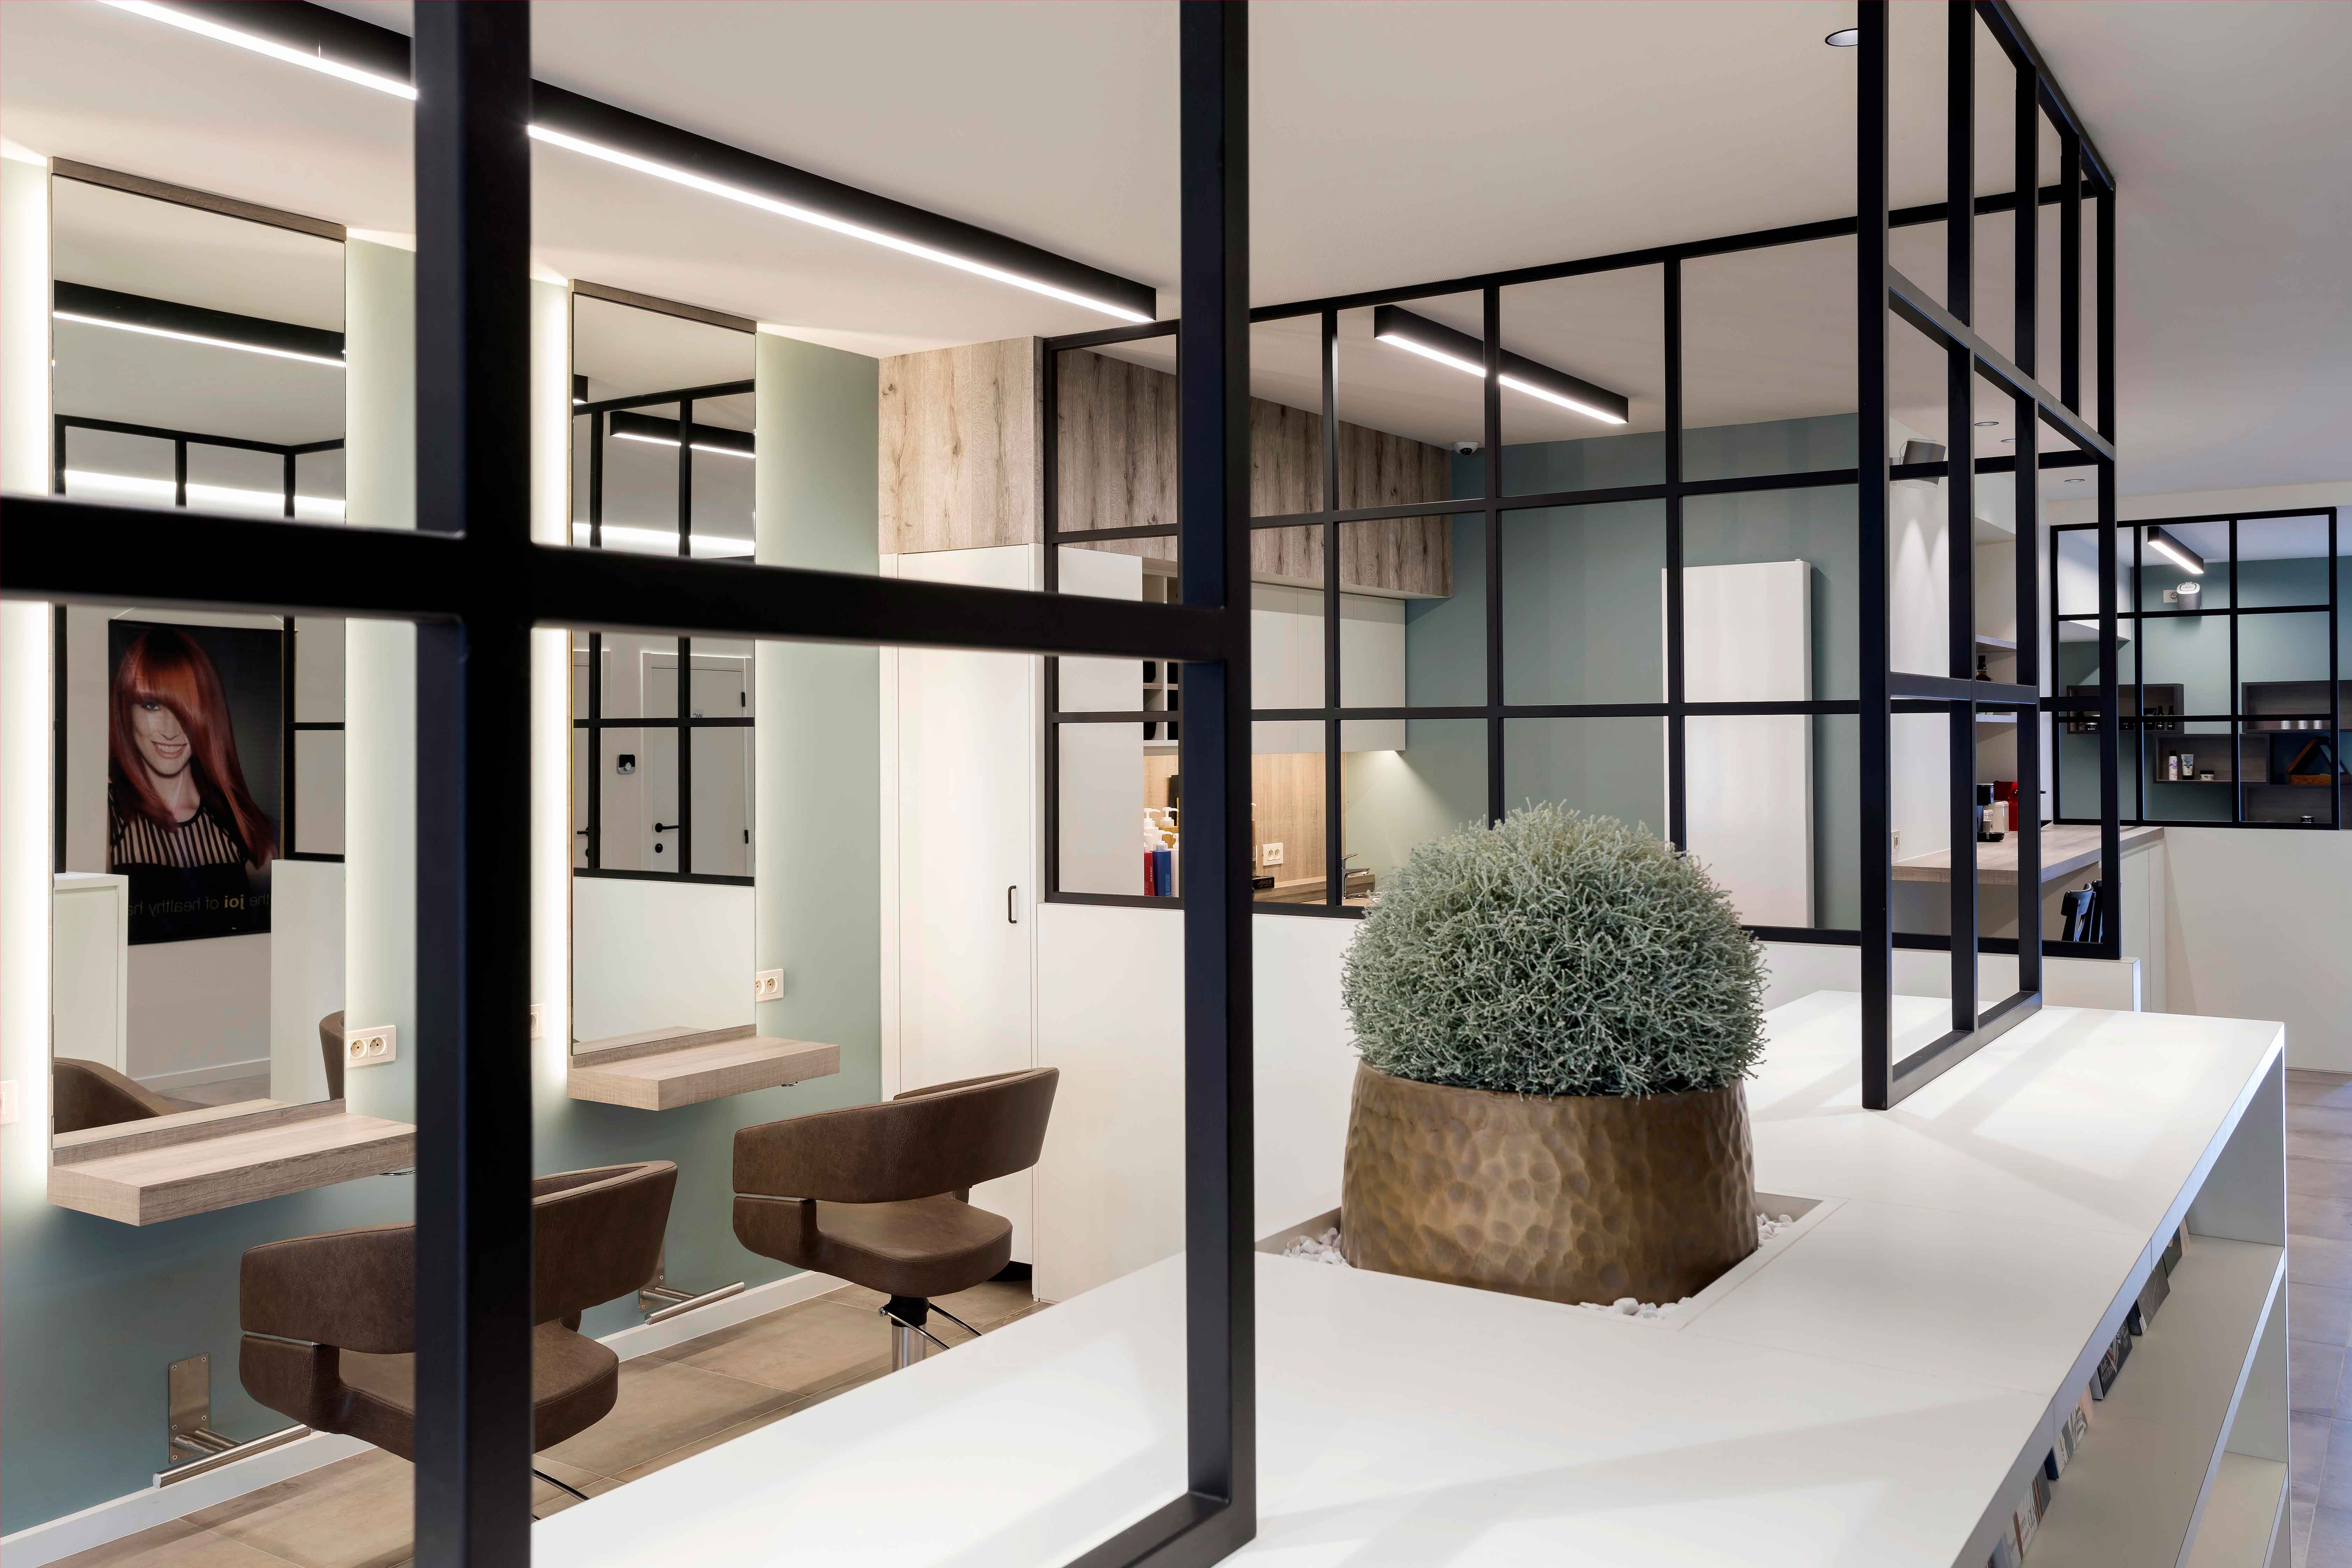 PAC realisation GUSTAFSSON salon interieur realisatie